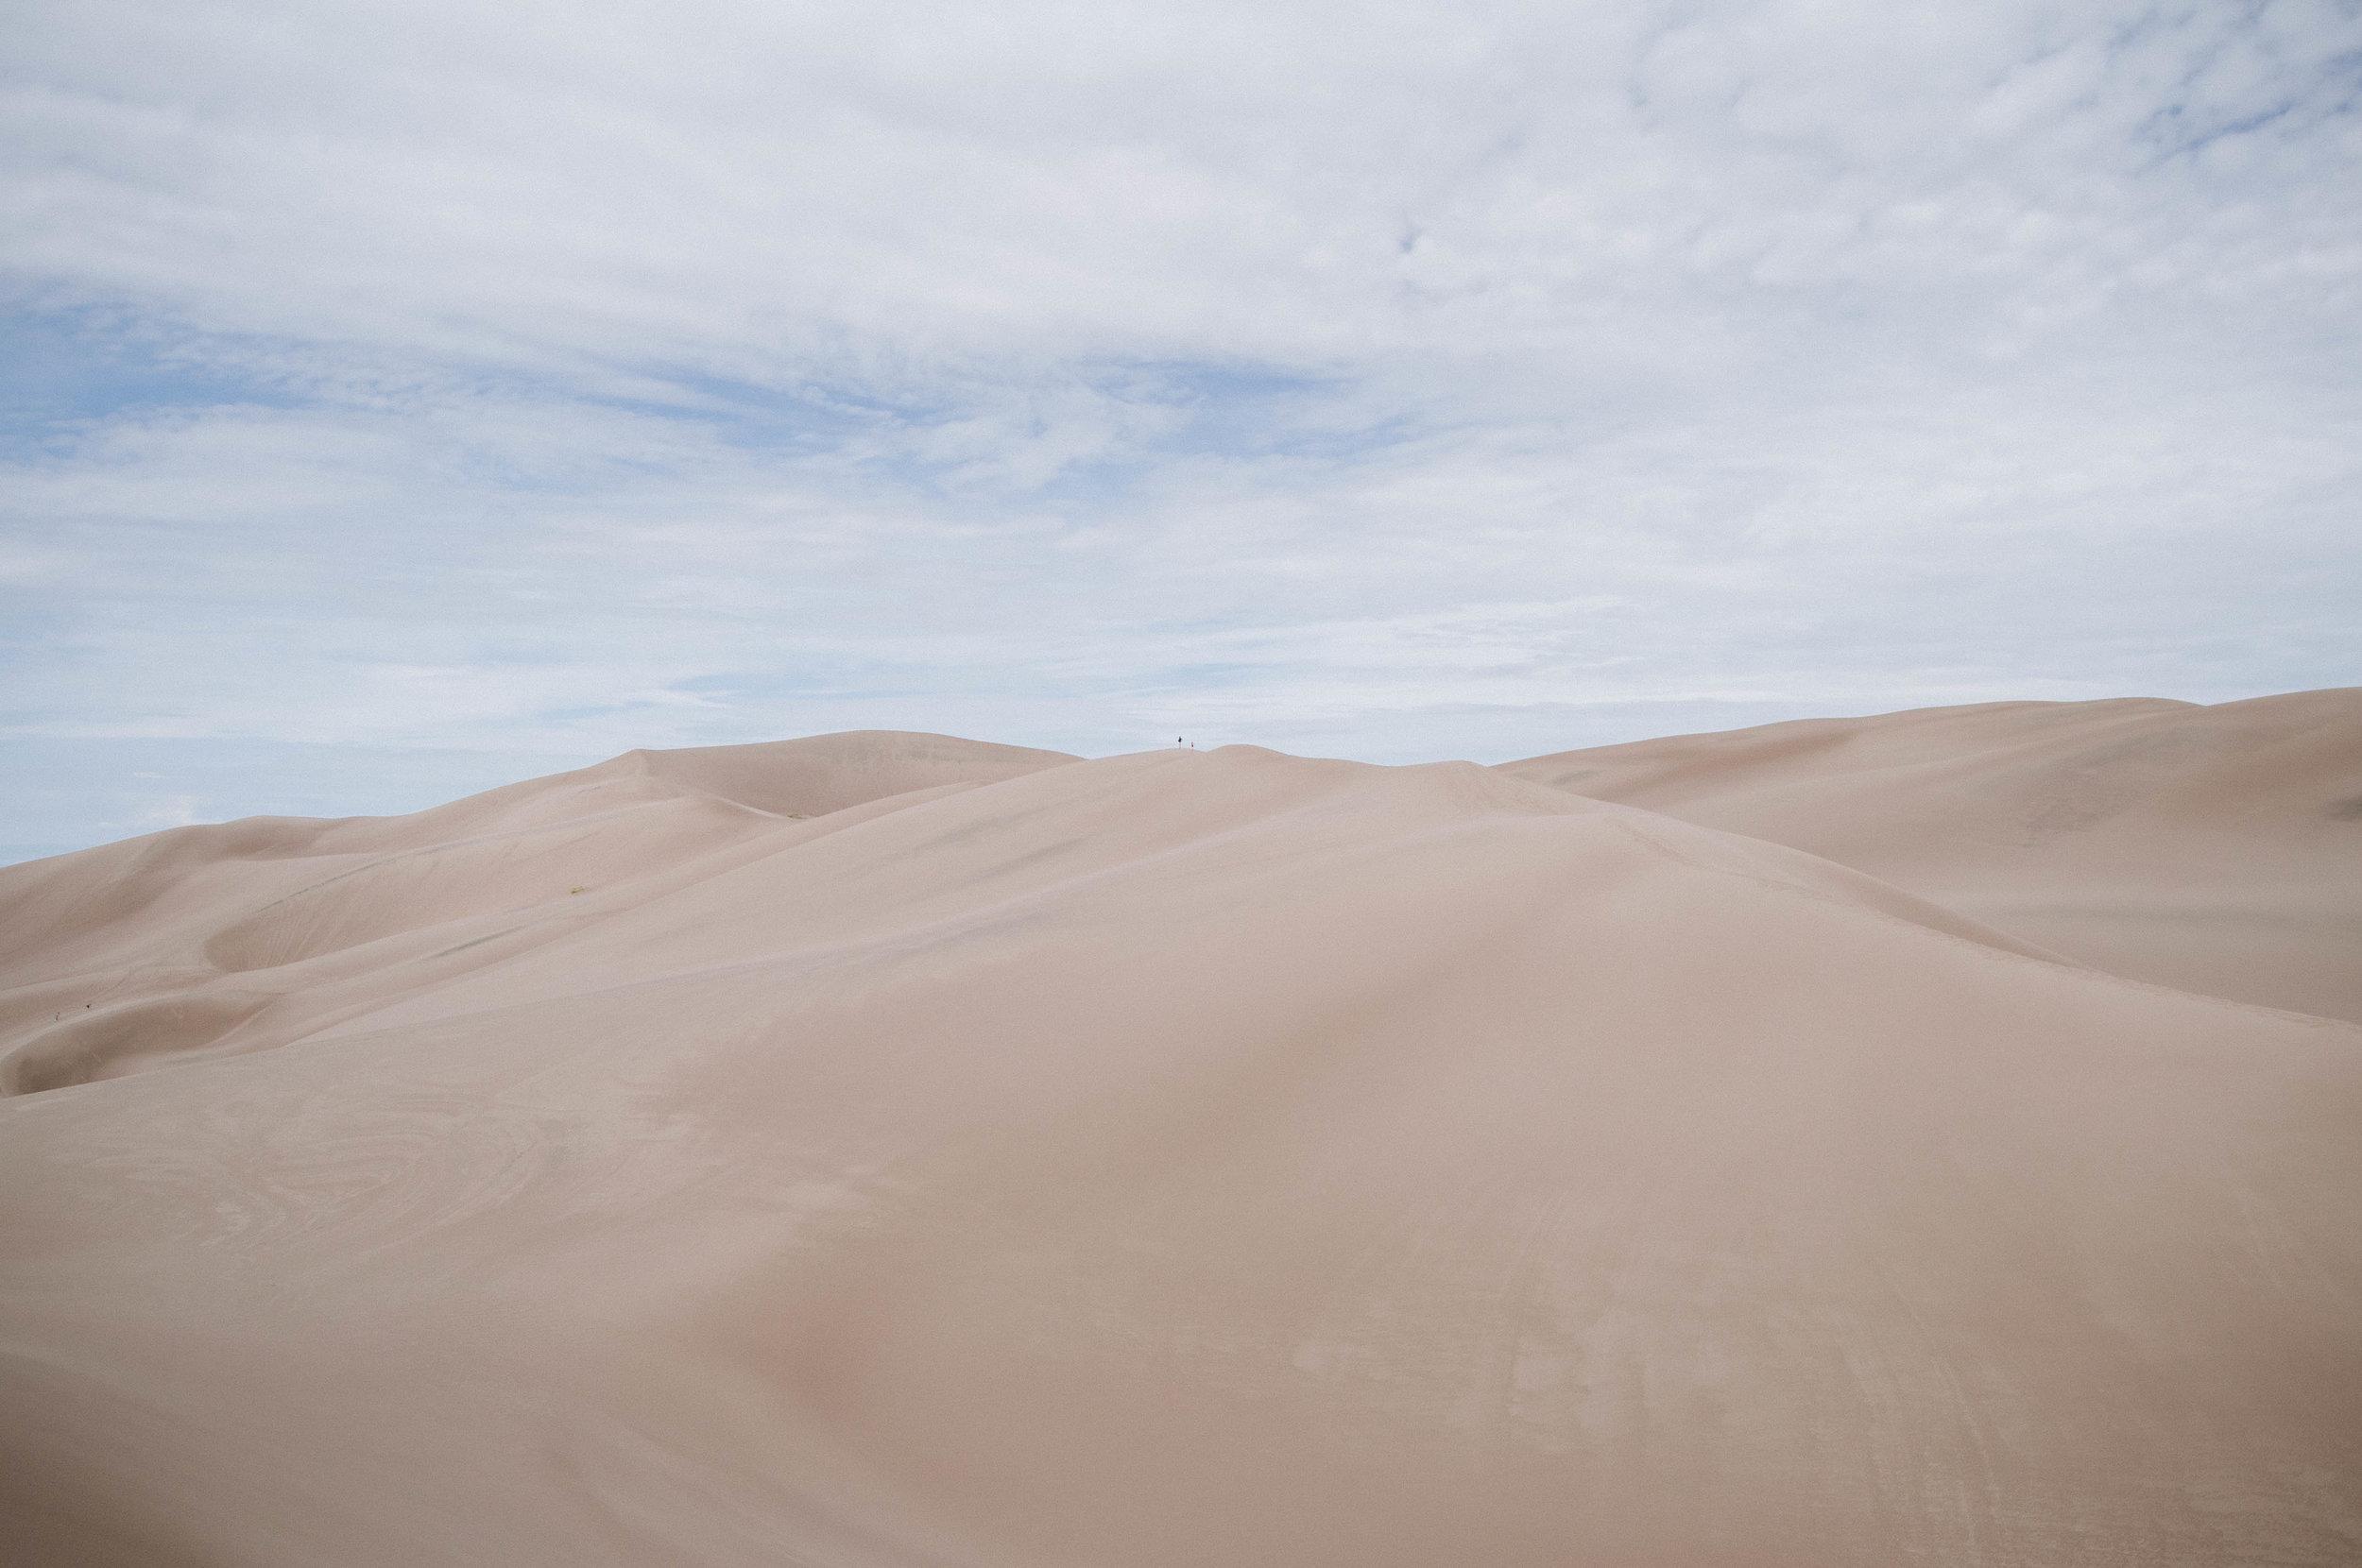 Great-Sand-Dunes-28.jpg